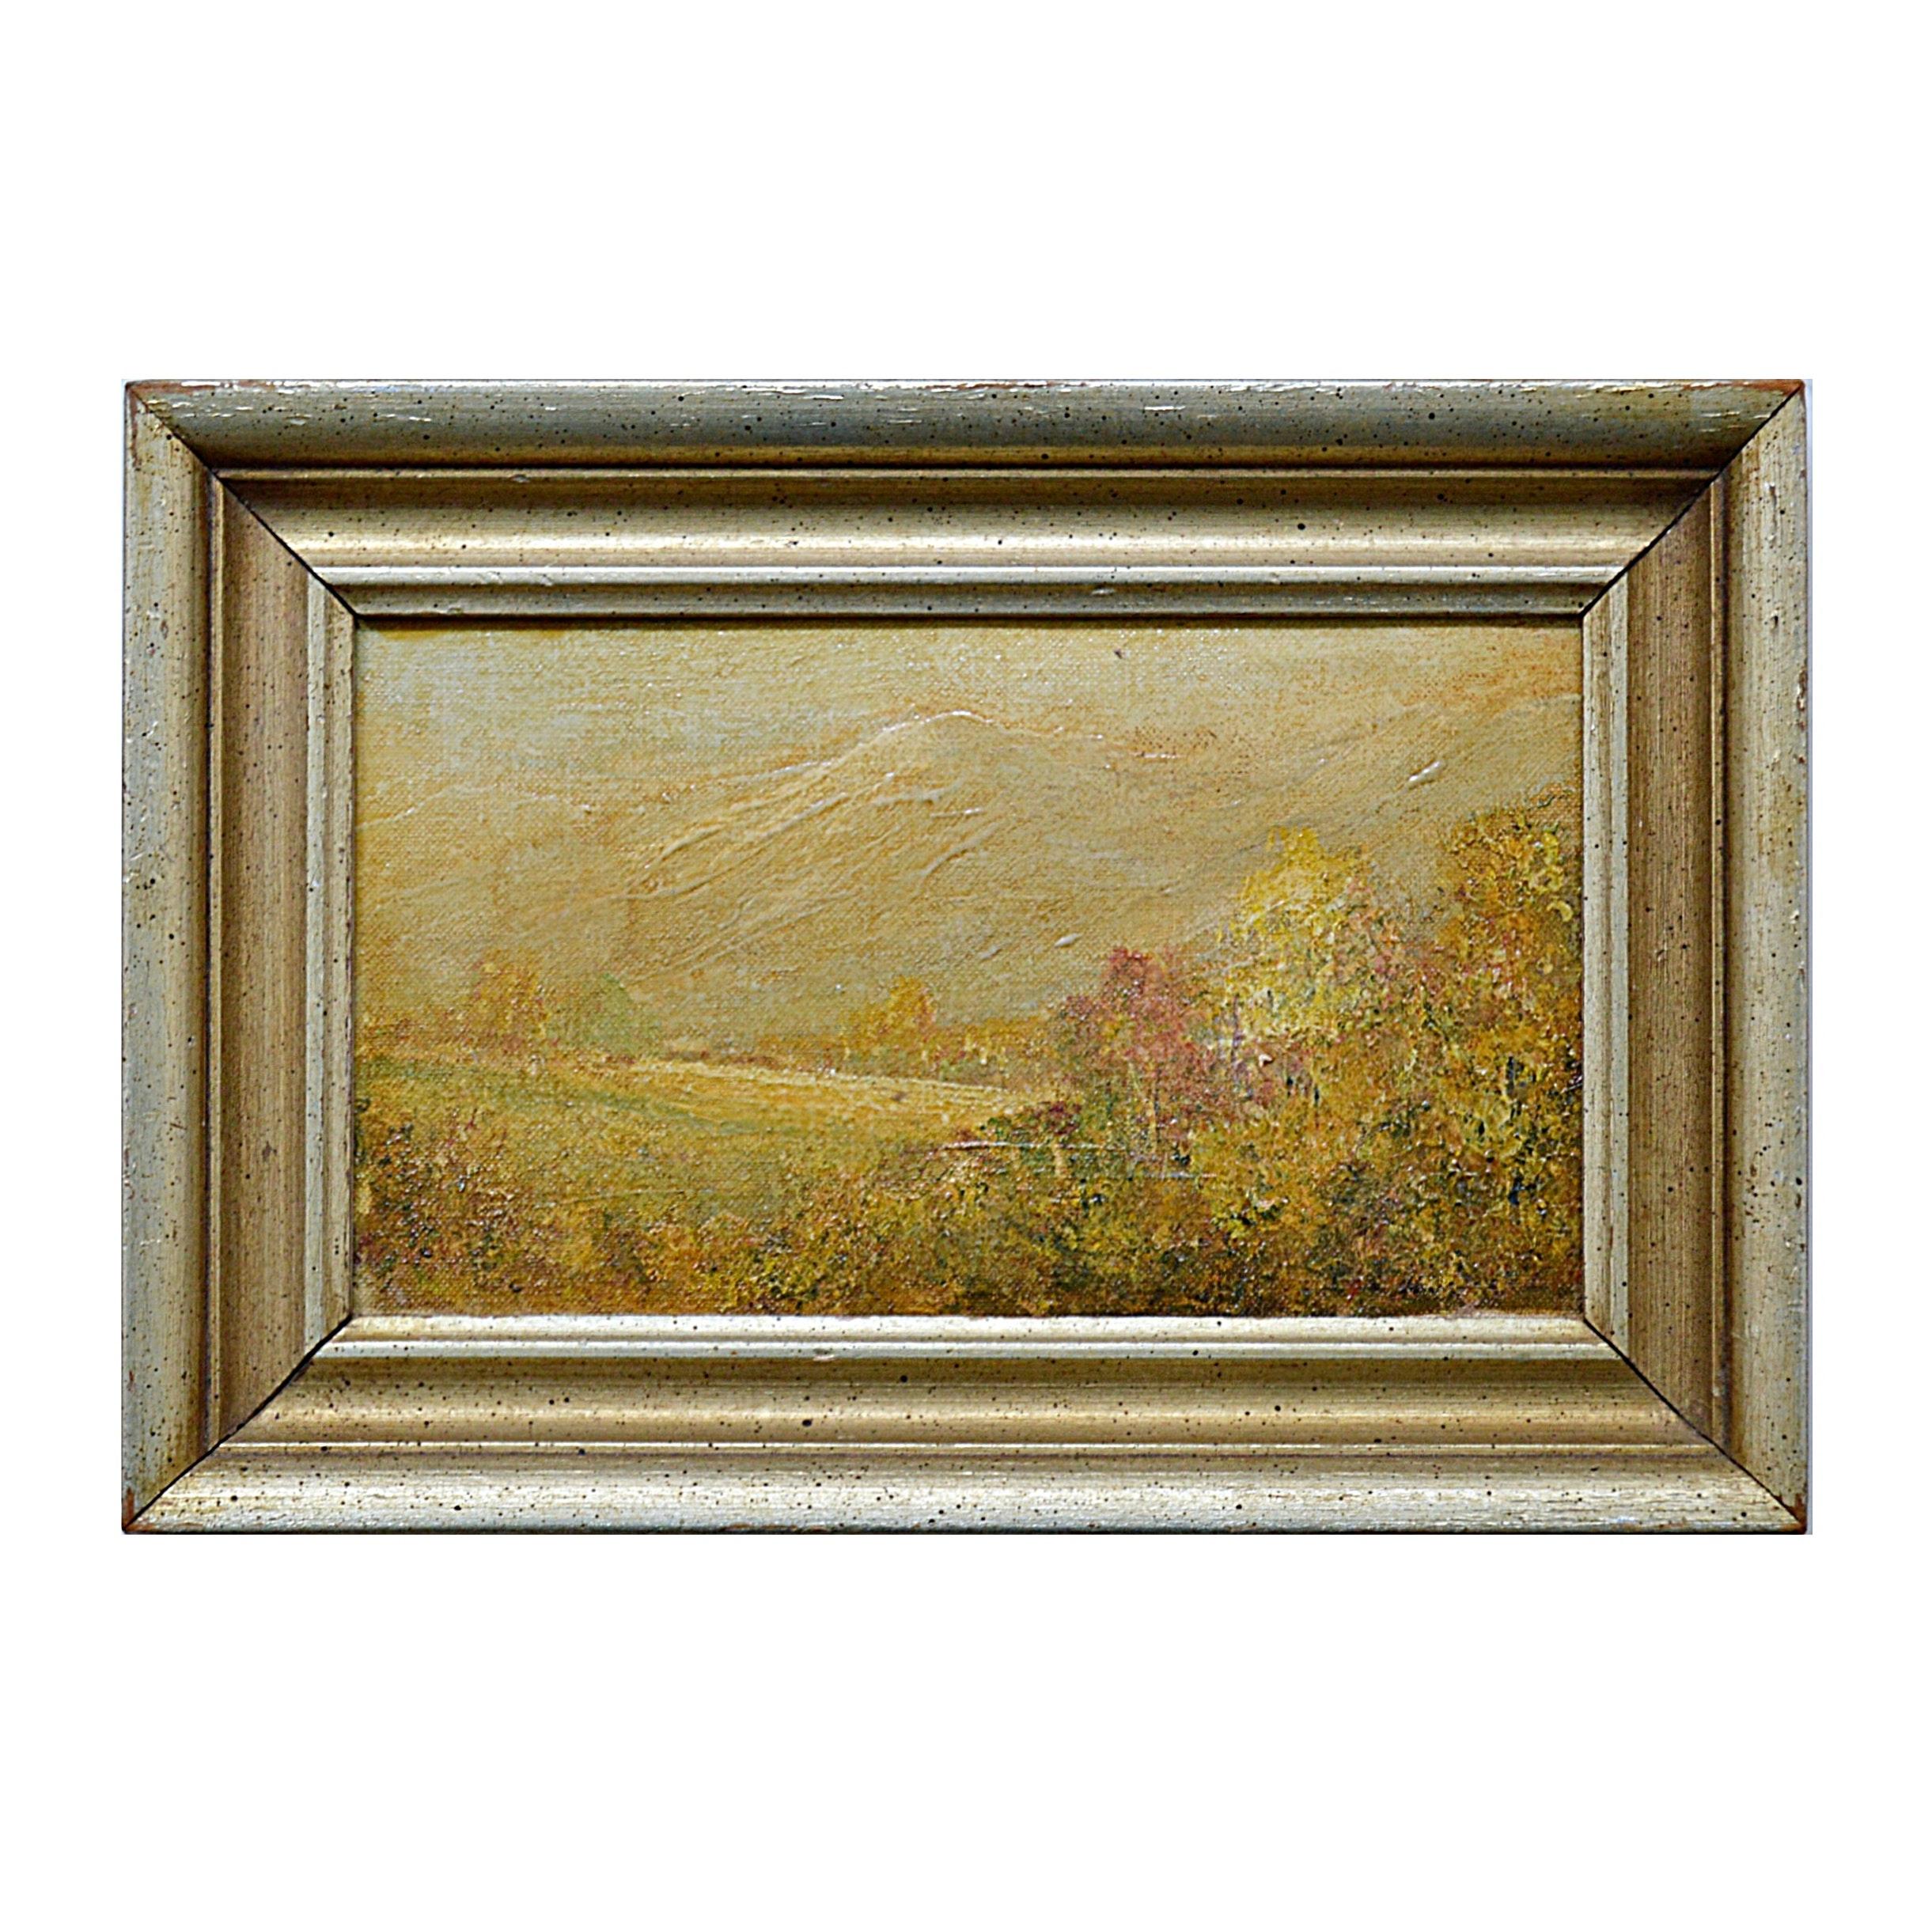 William Eyden Oil on Canvas Landscape